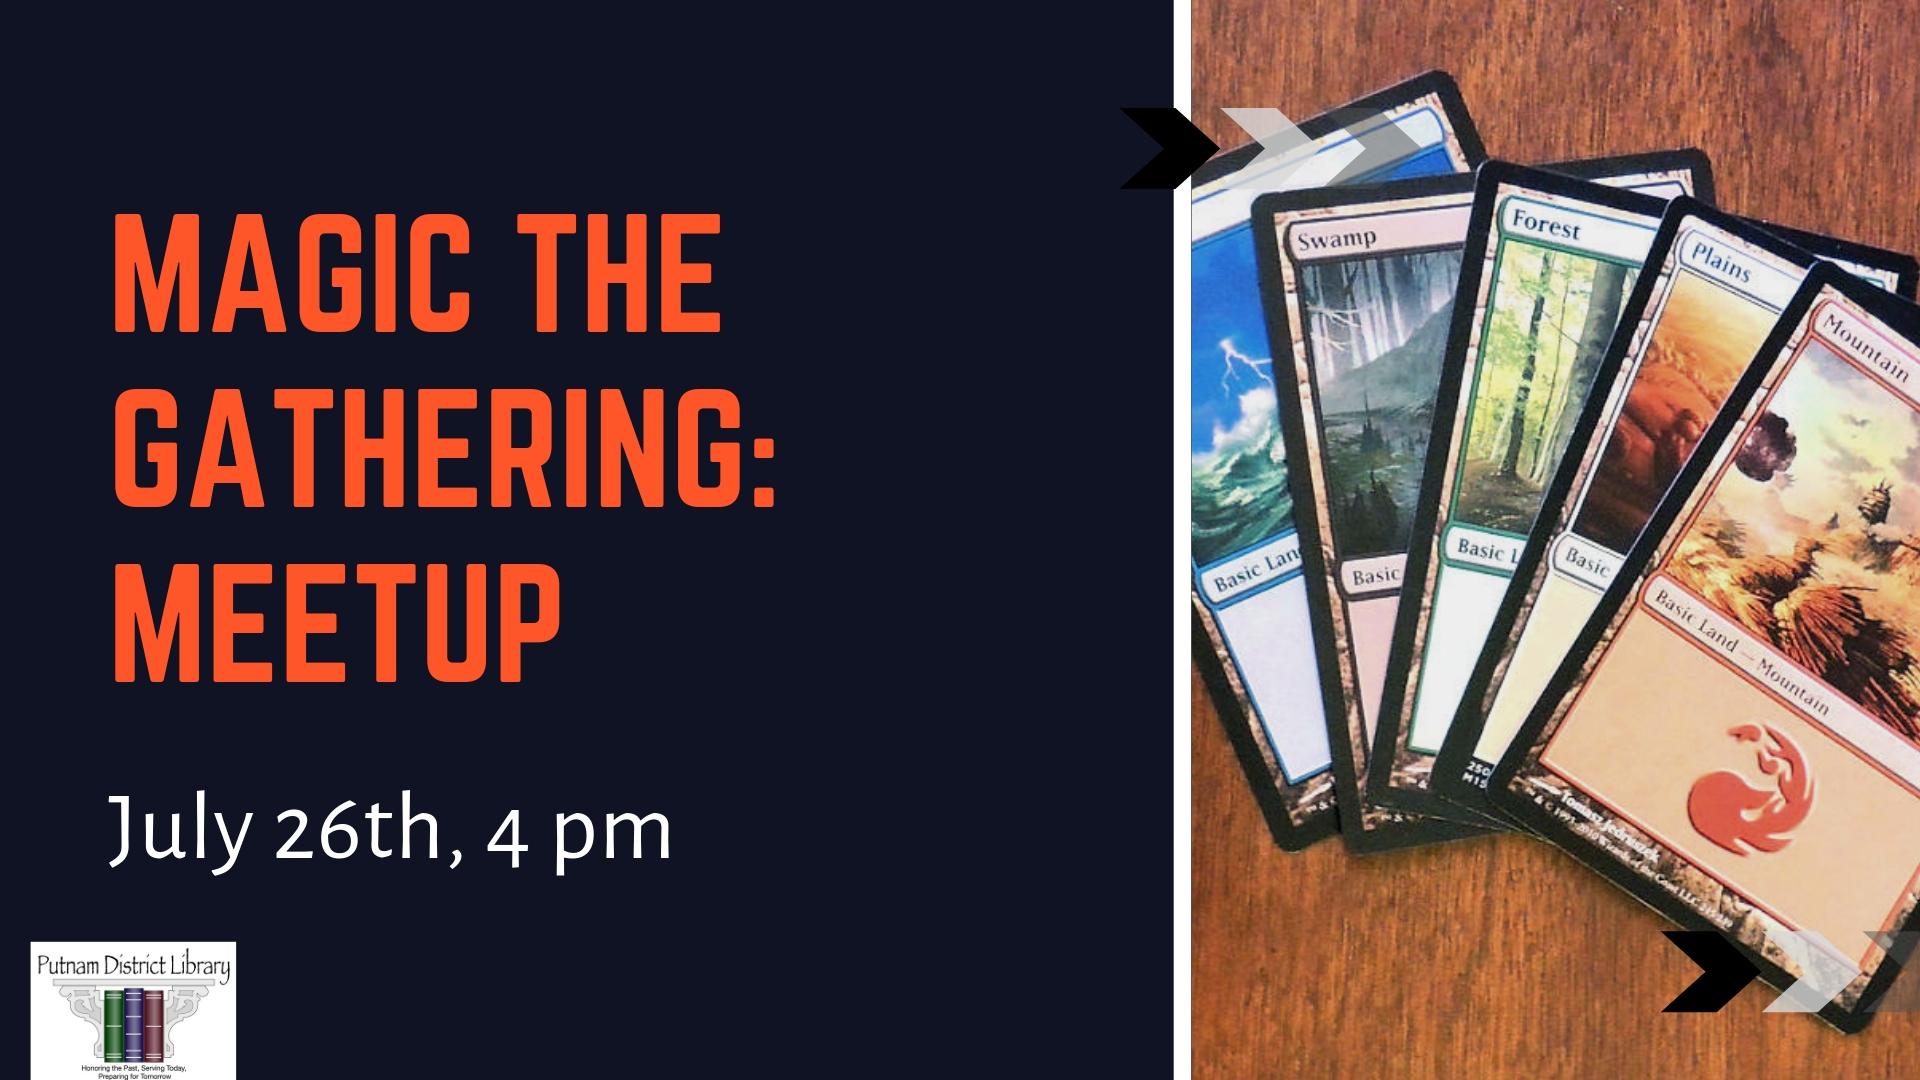 Magic: The Gathering Meeting